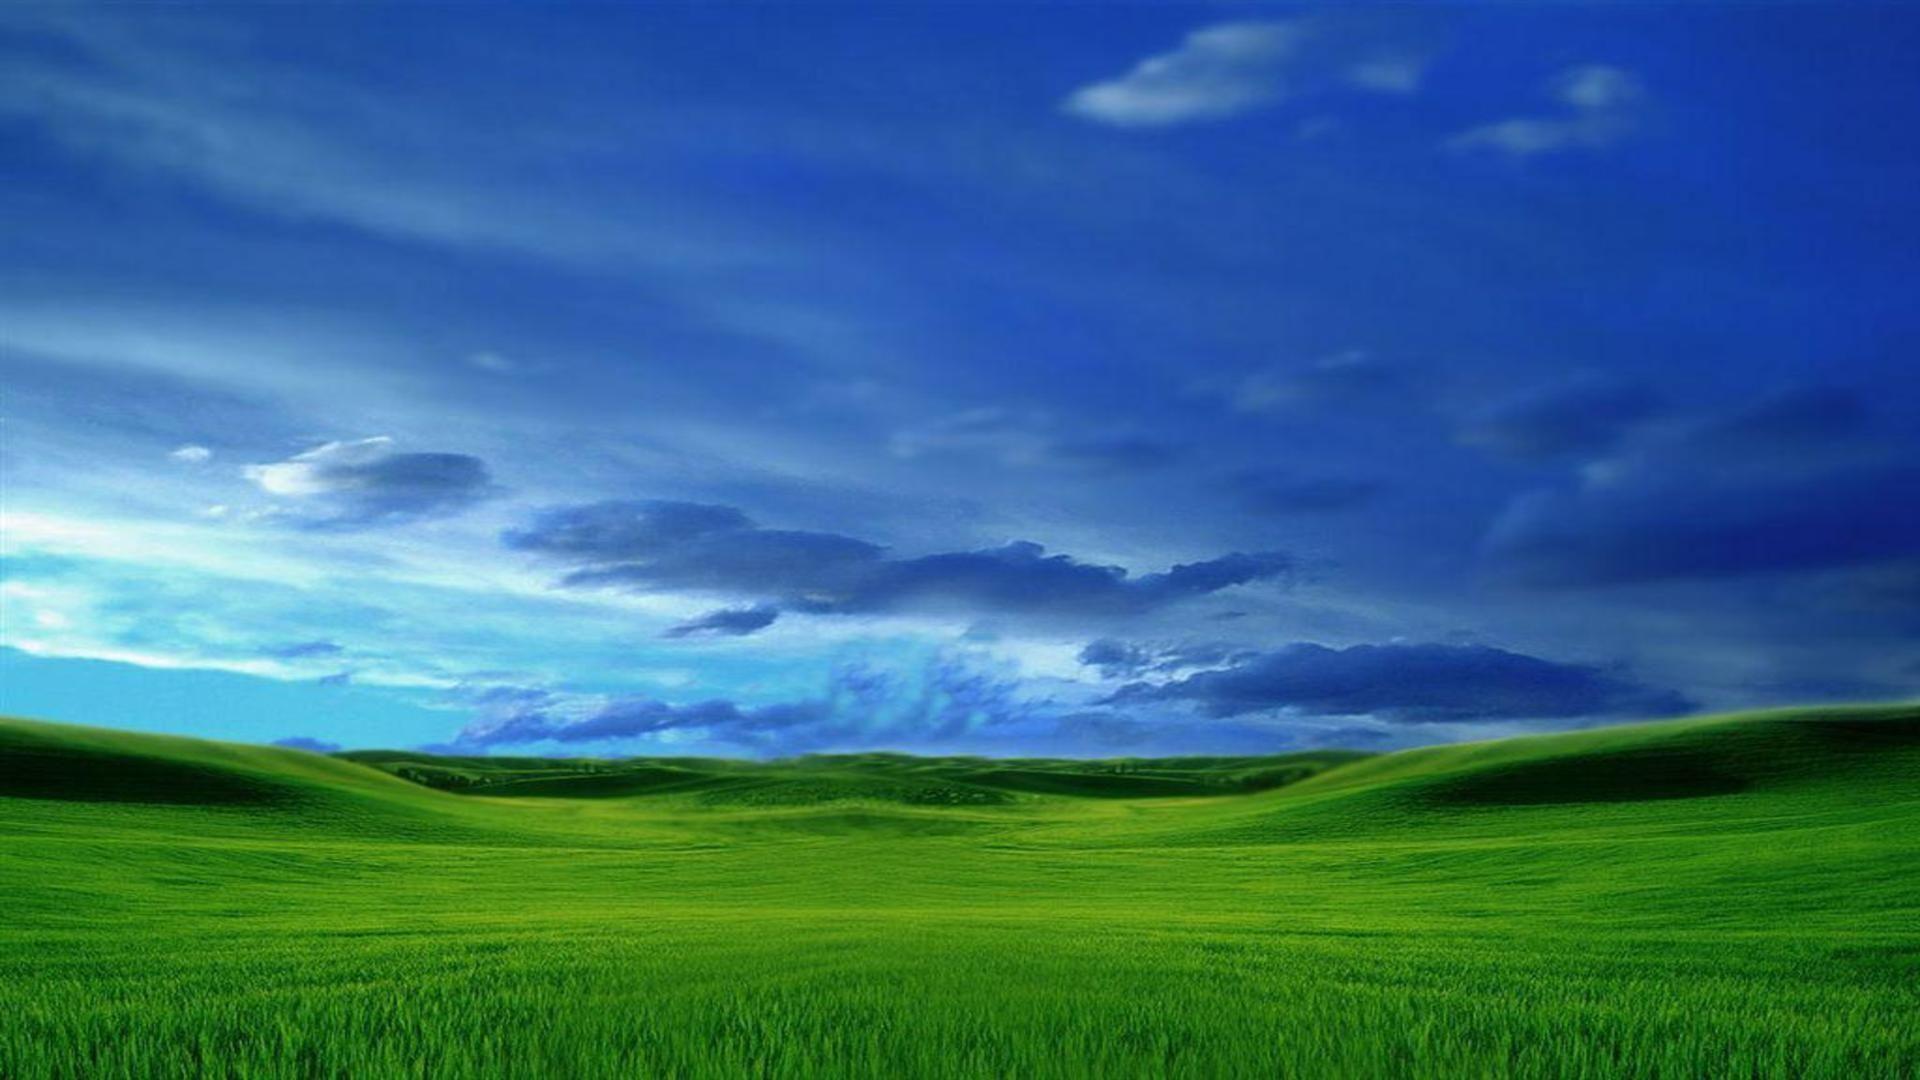 Microsoft desktop backgrounds 59 images - Microsoft wallpaper ...